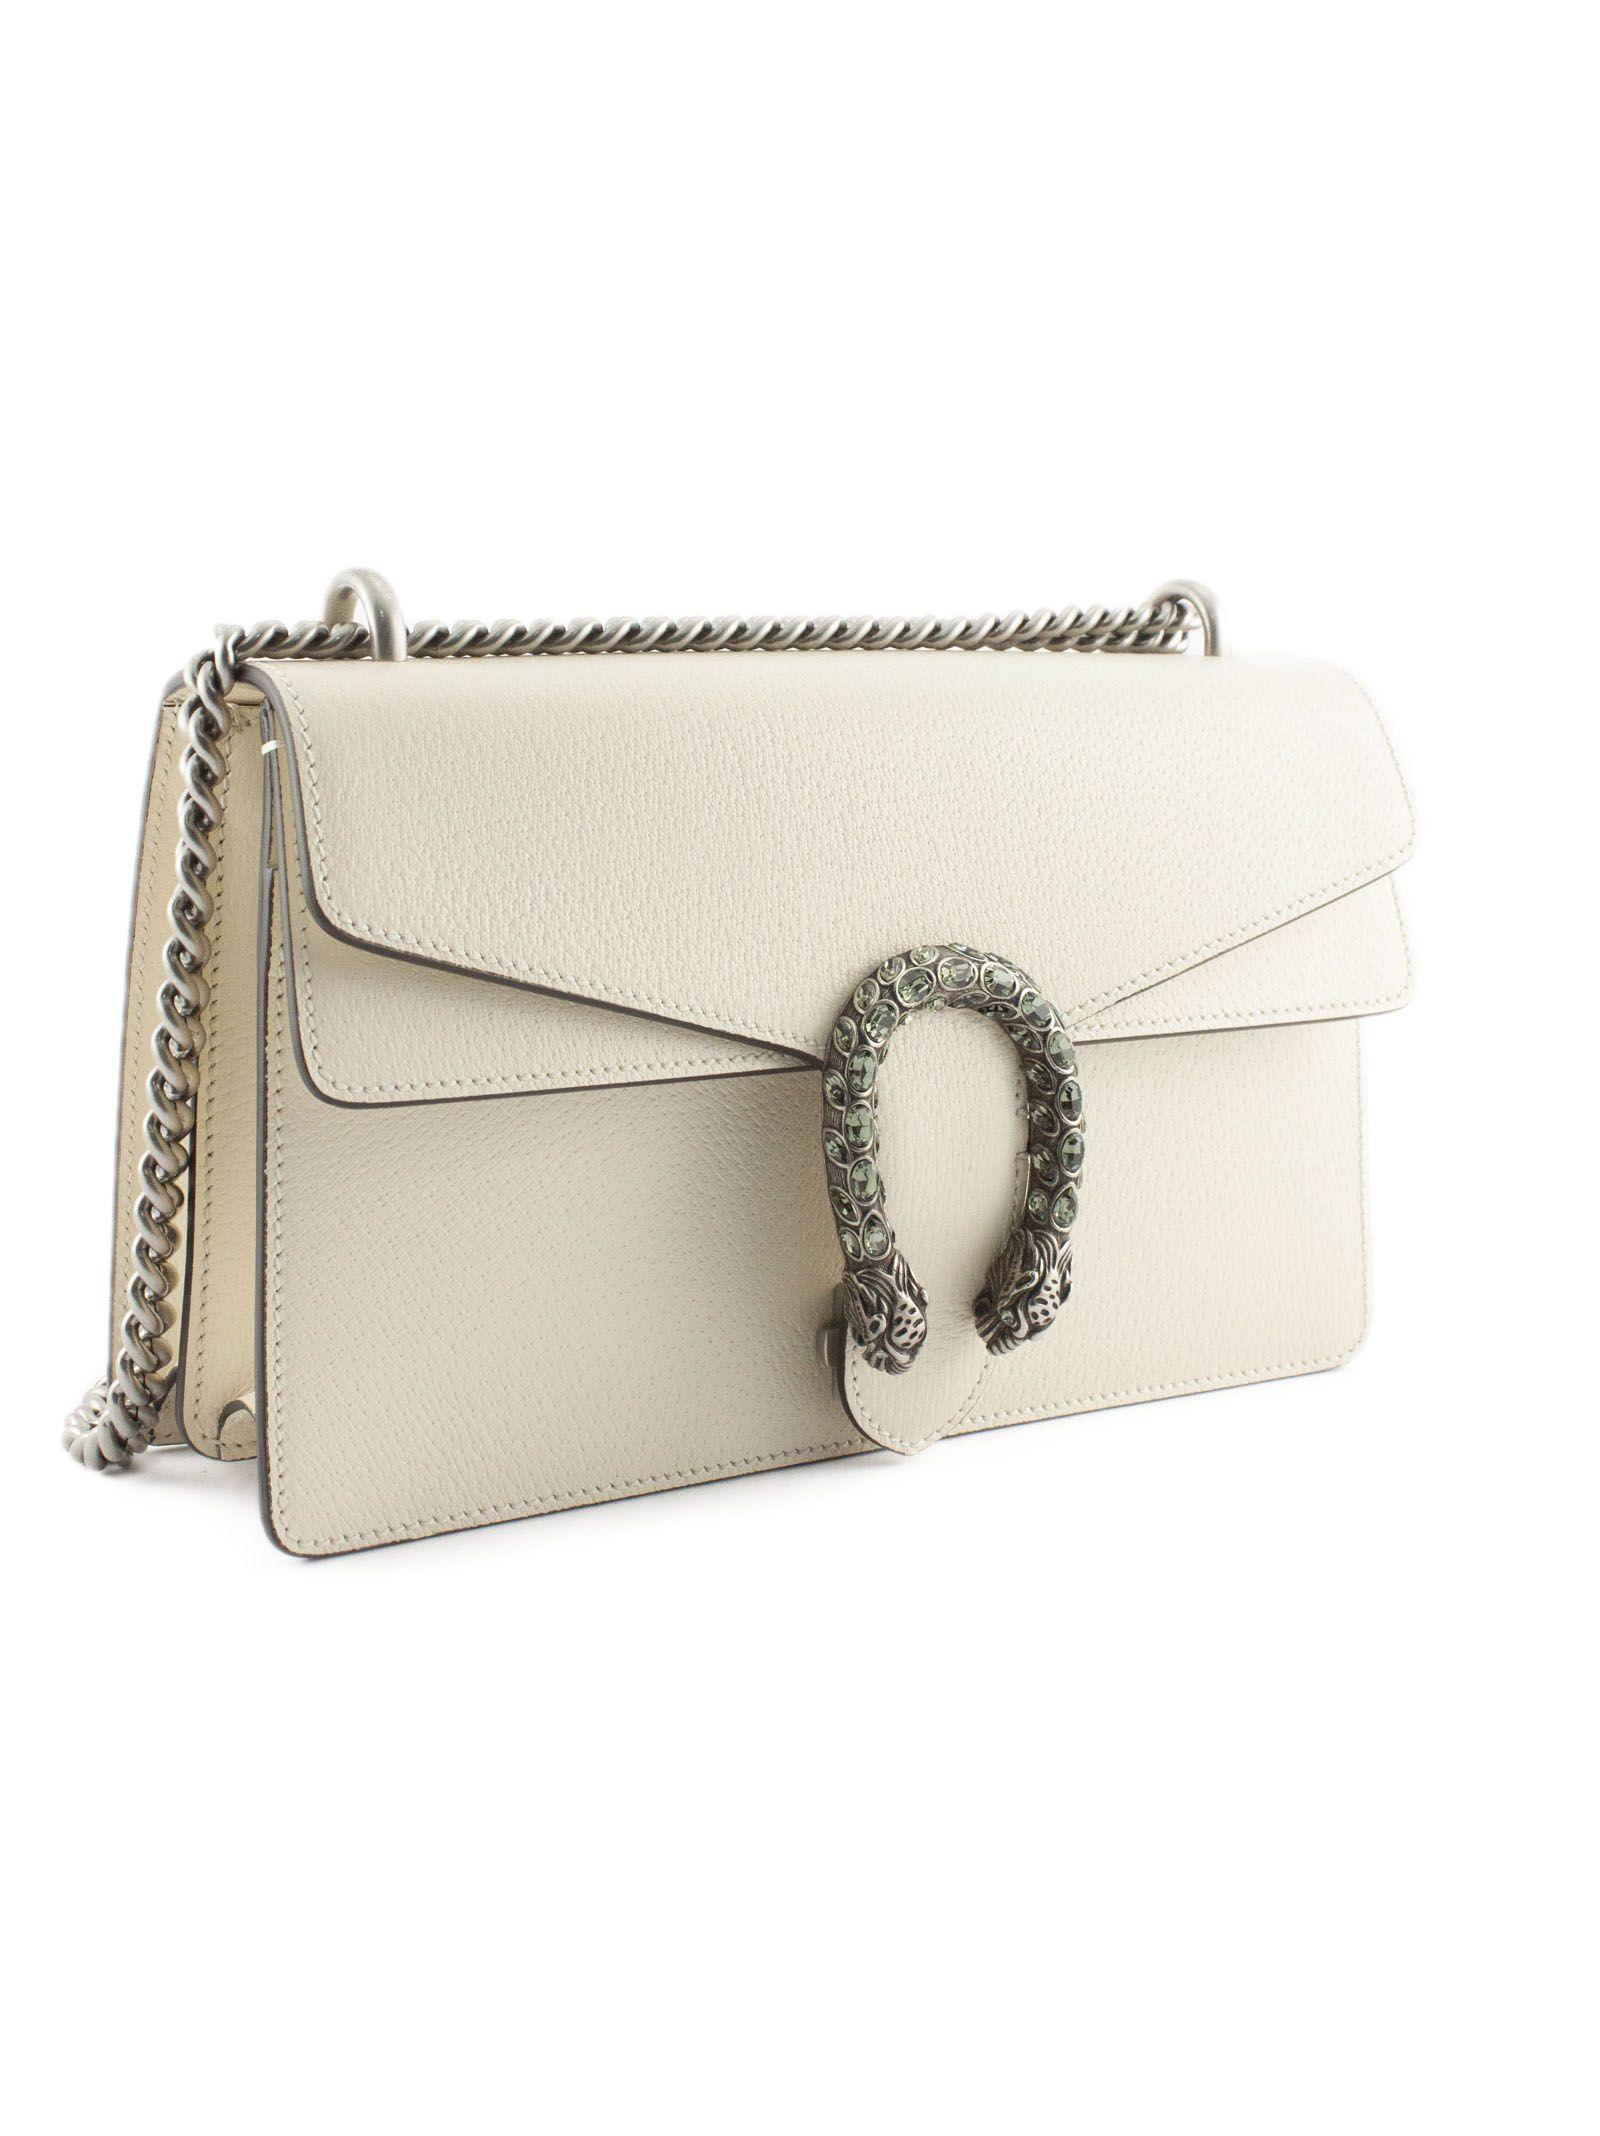 4040f1c3c5f Gucci Gucci White Leather Dionysus Shoulder Bag - Panna - 10825133 ...